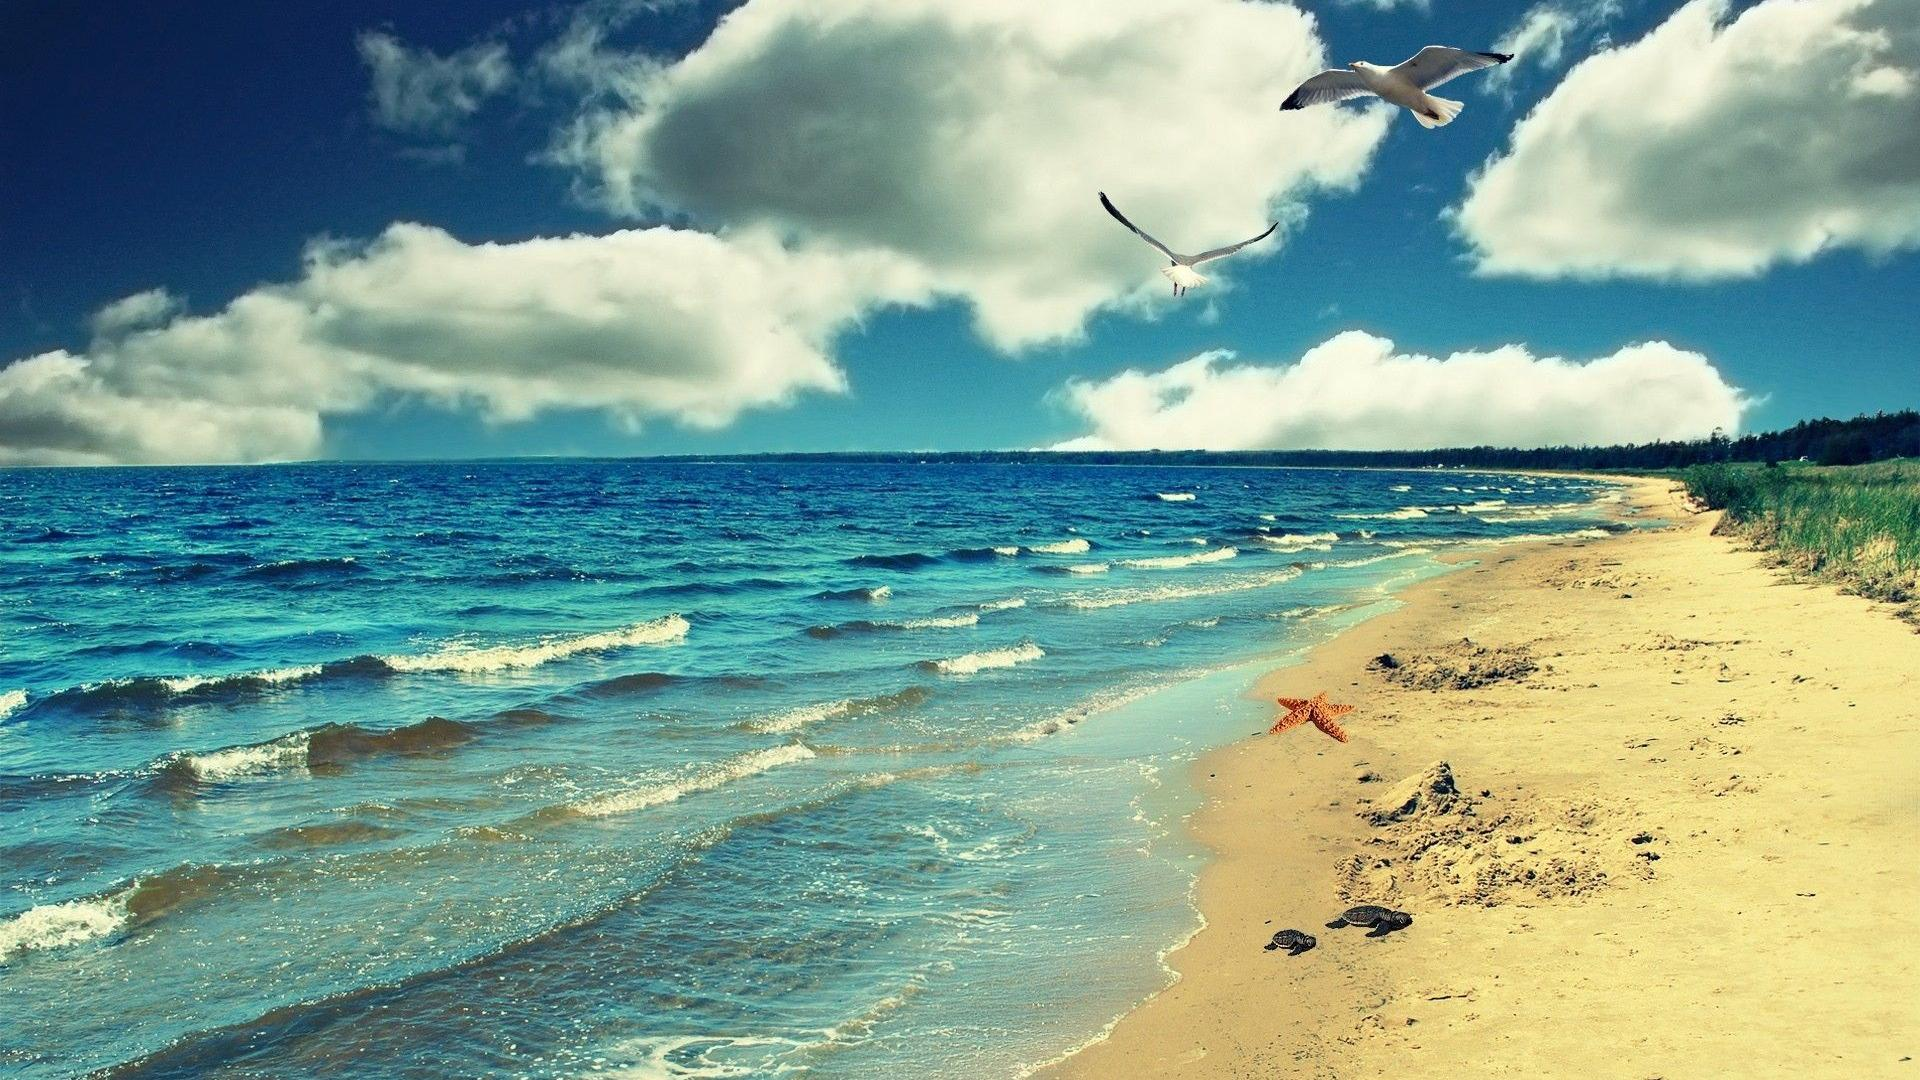 Hd Wallpapers 1080p Ocean: Hd Beach Wallpapers 1080p With 1920×1080 Pixel